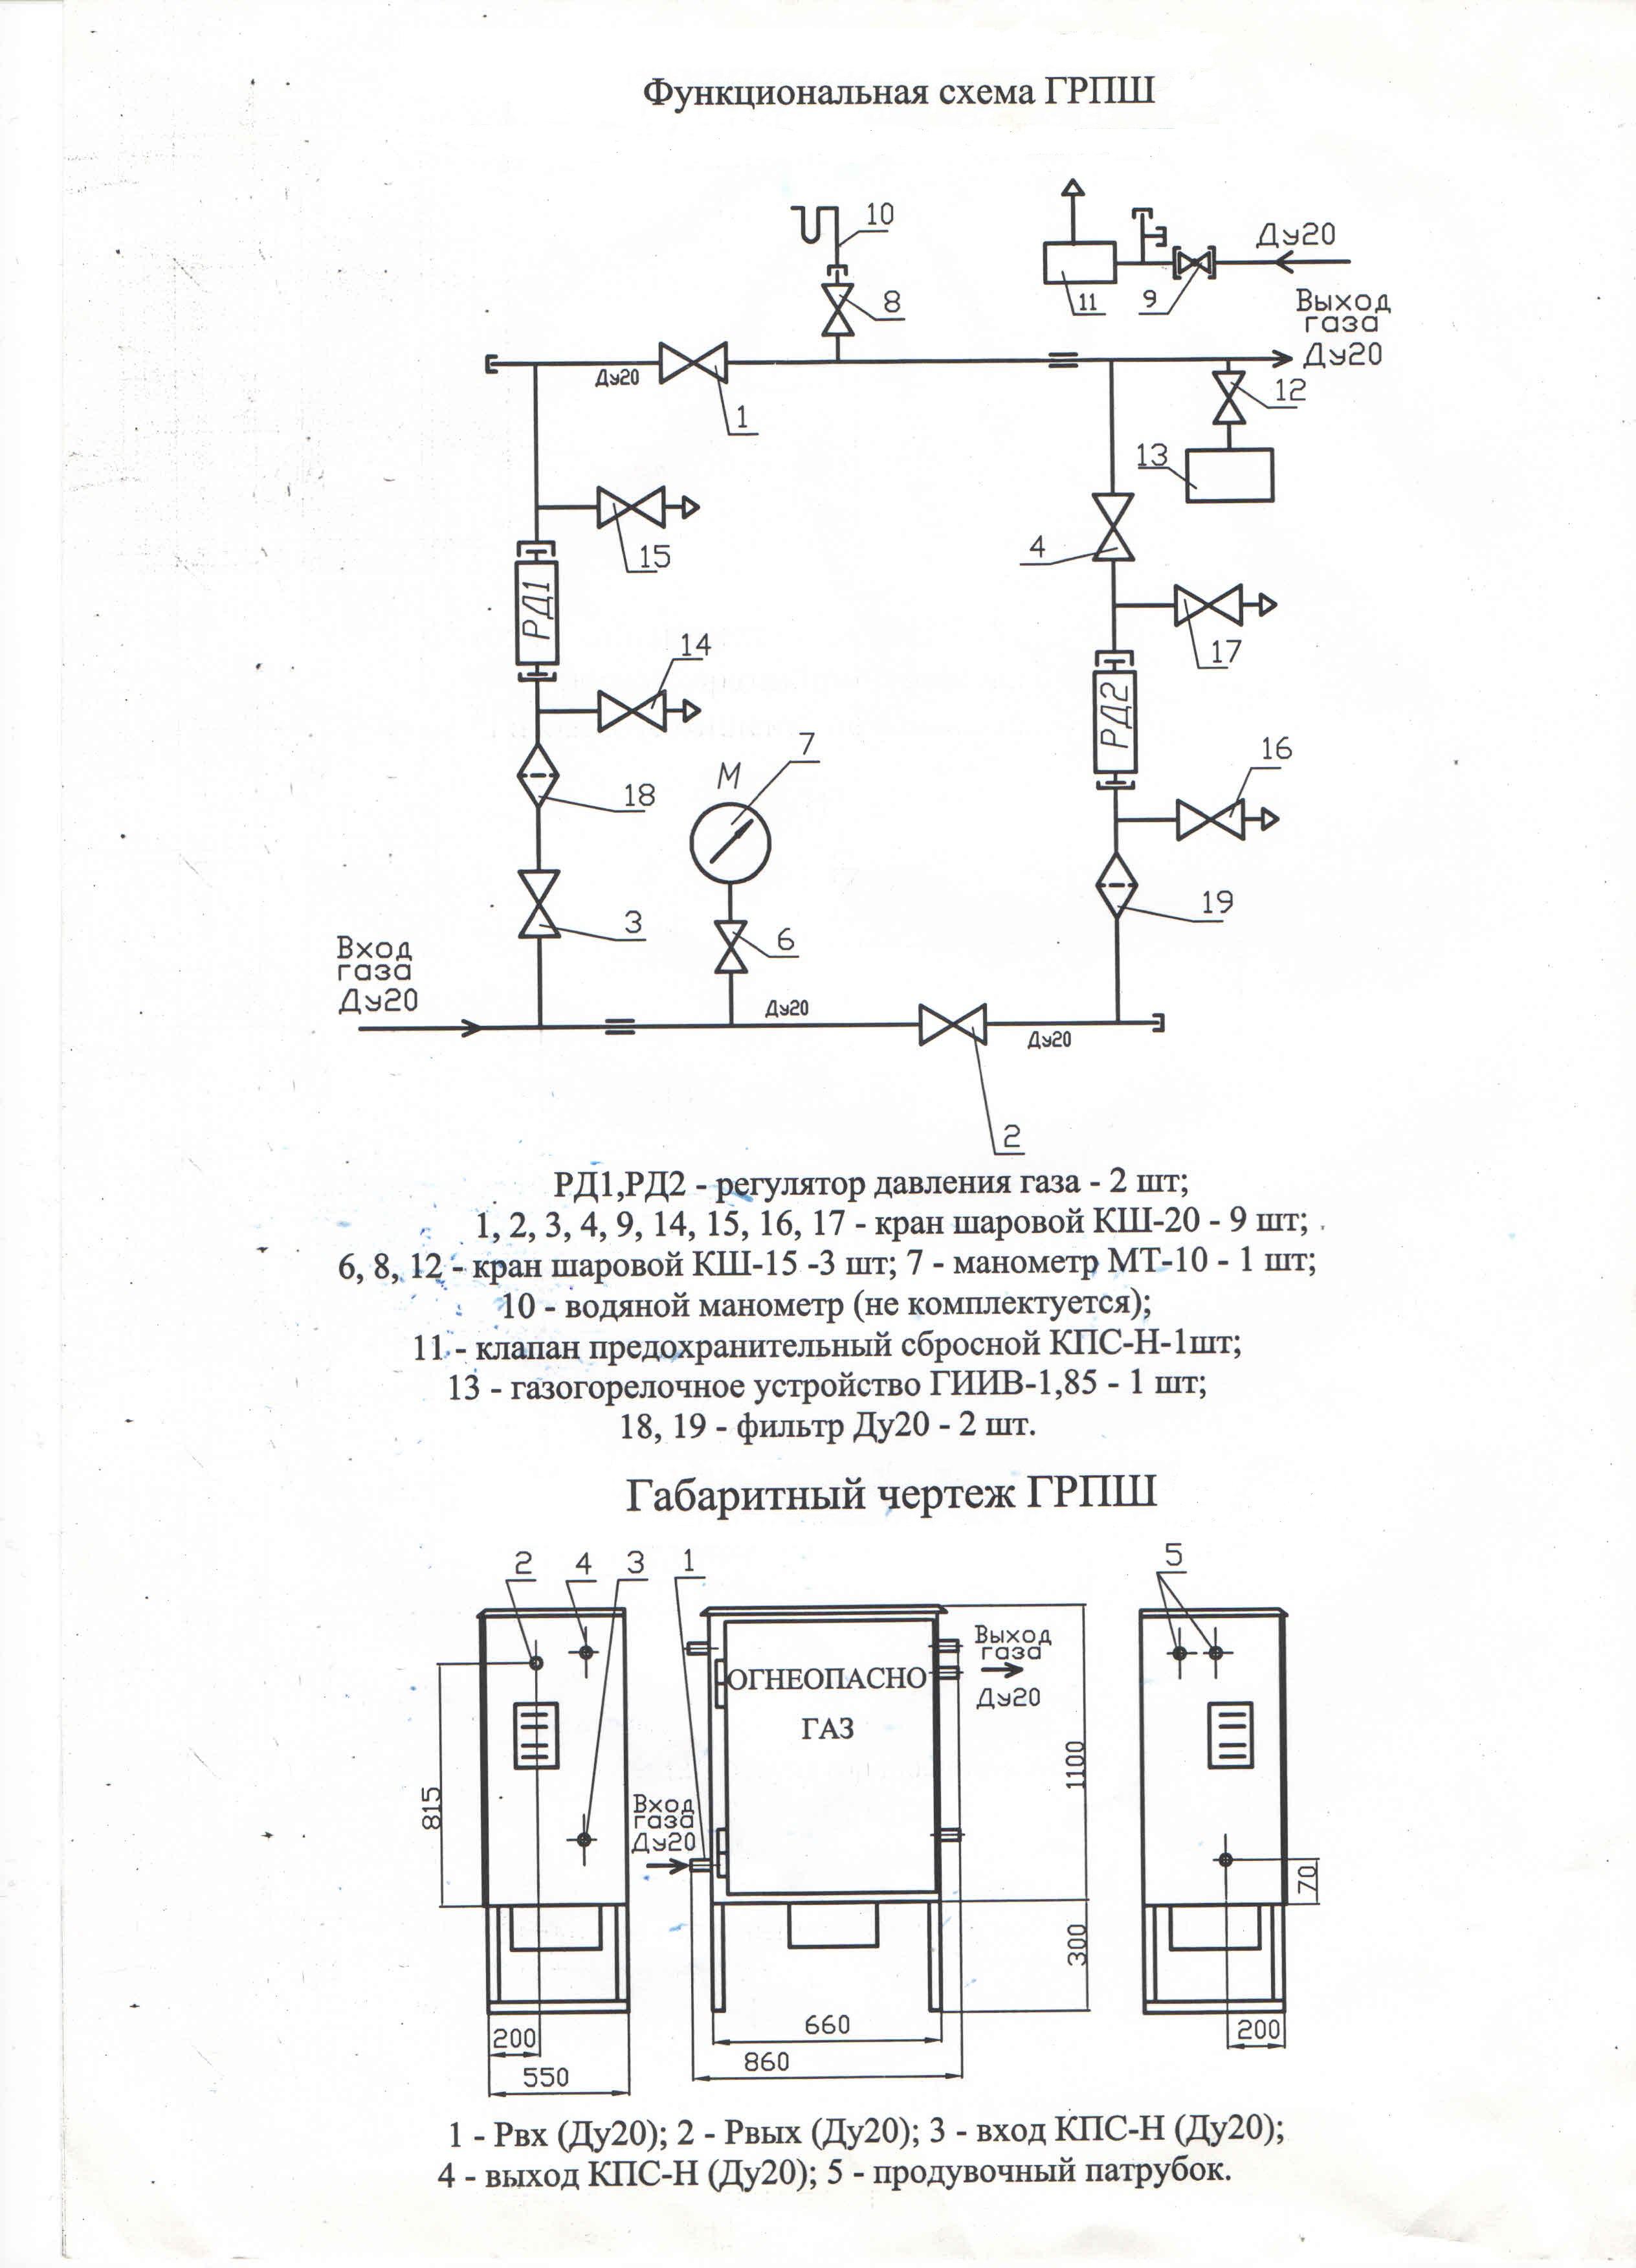 функциональная схема грпш 10мс-2у1